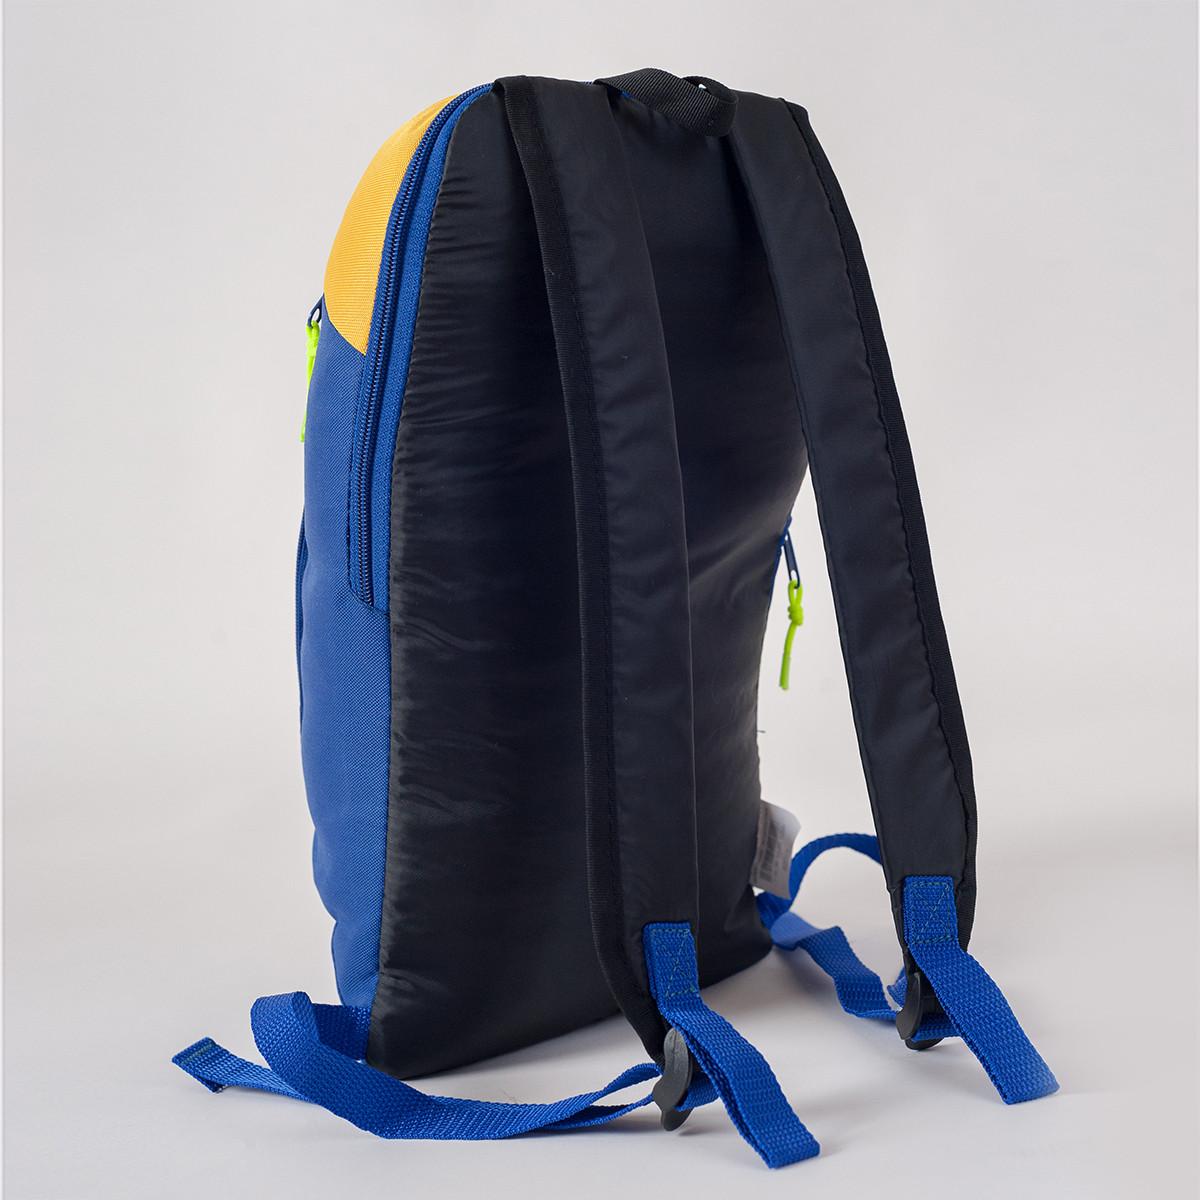 Спортивный рюкзак MAYERS 10L, синий + желтый, фото 3